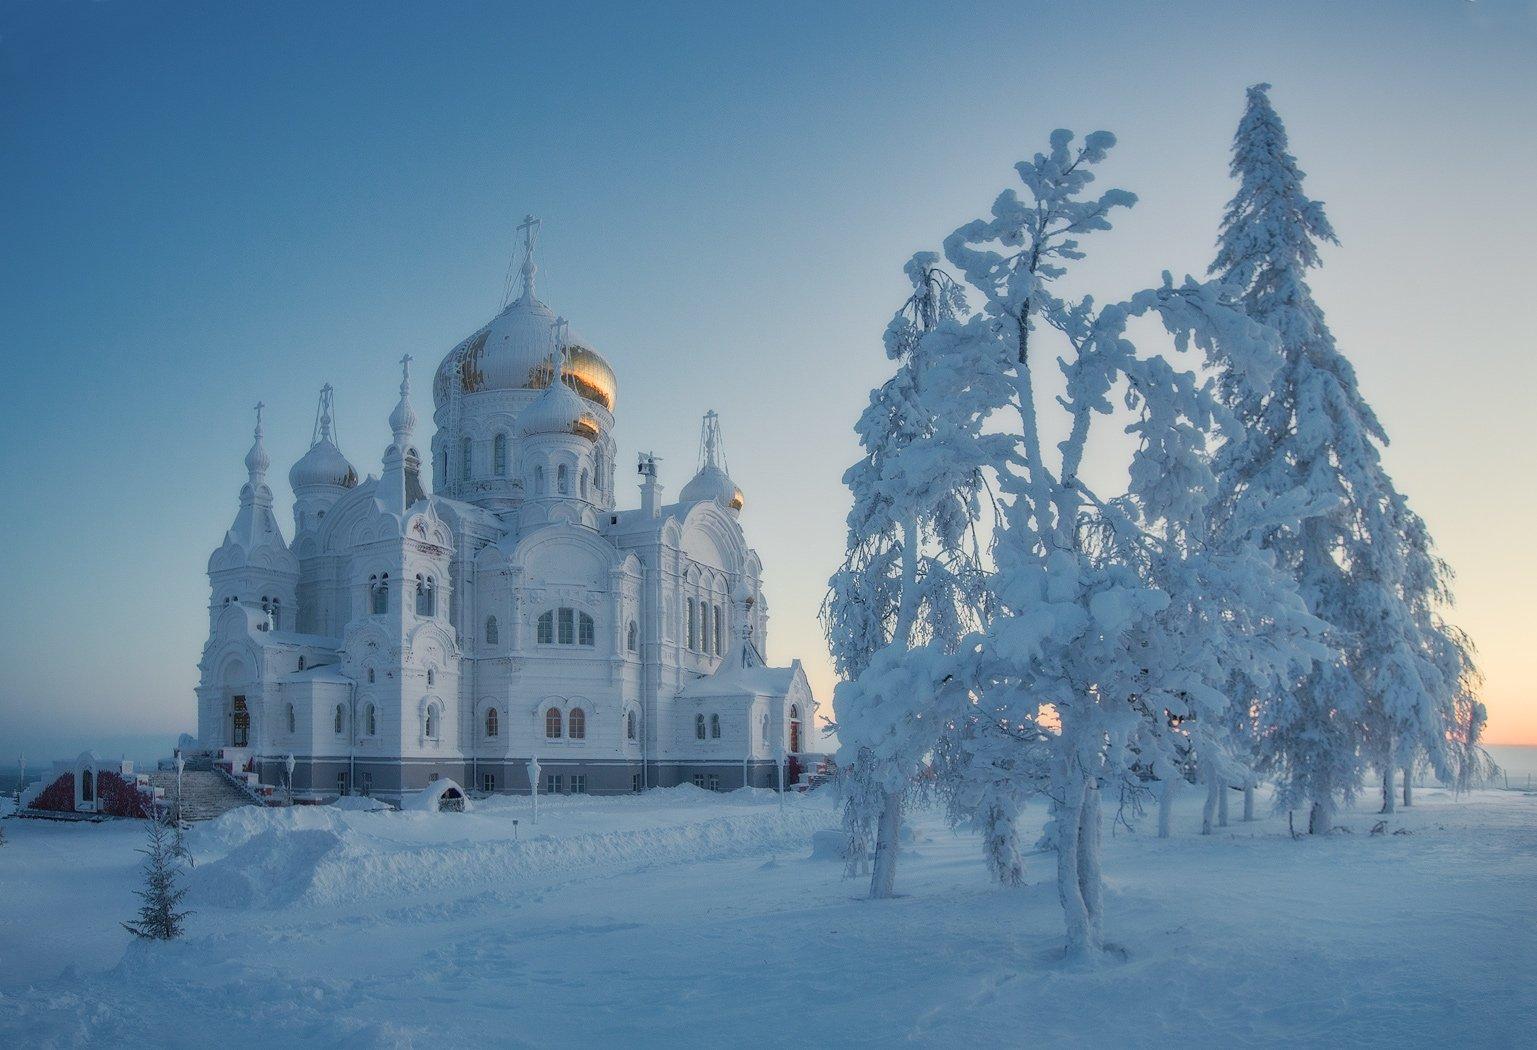 белогорье белая гора белогорский монастырь, Vladimir Lipetskih